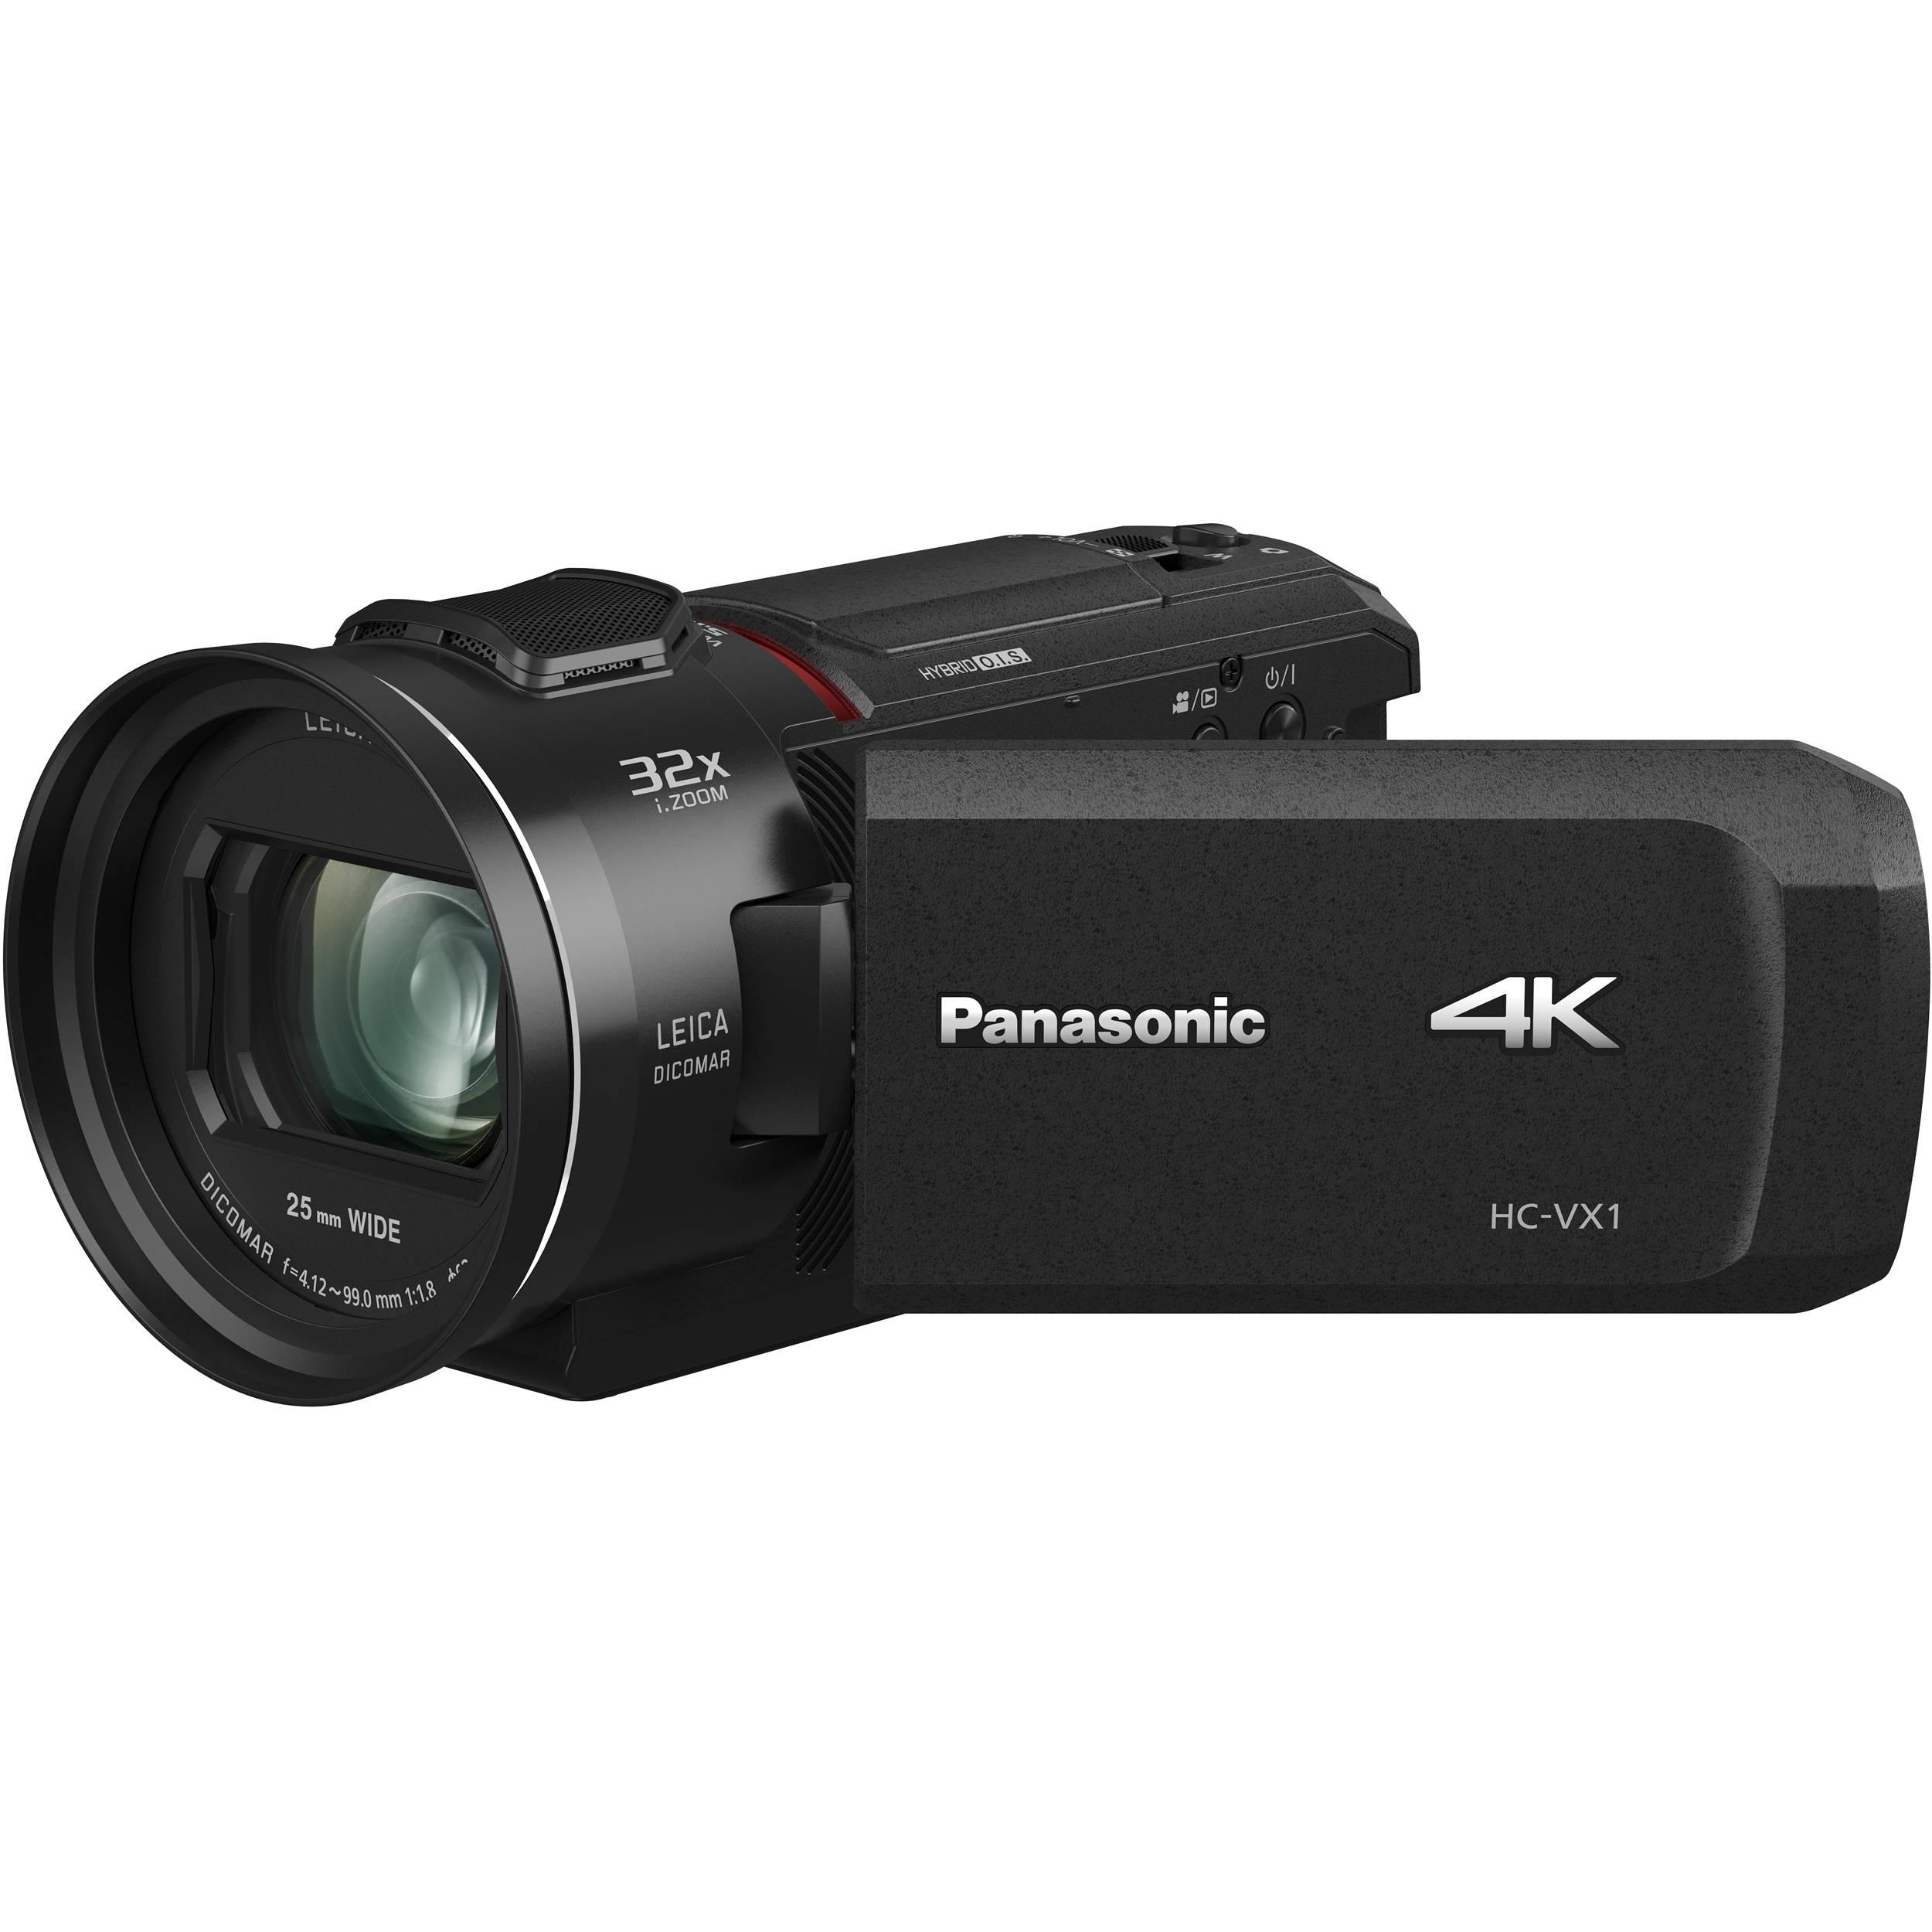 Panasonic HCVX1 Camcorder